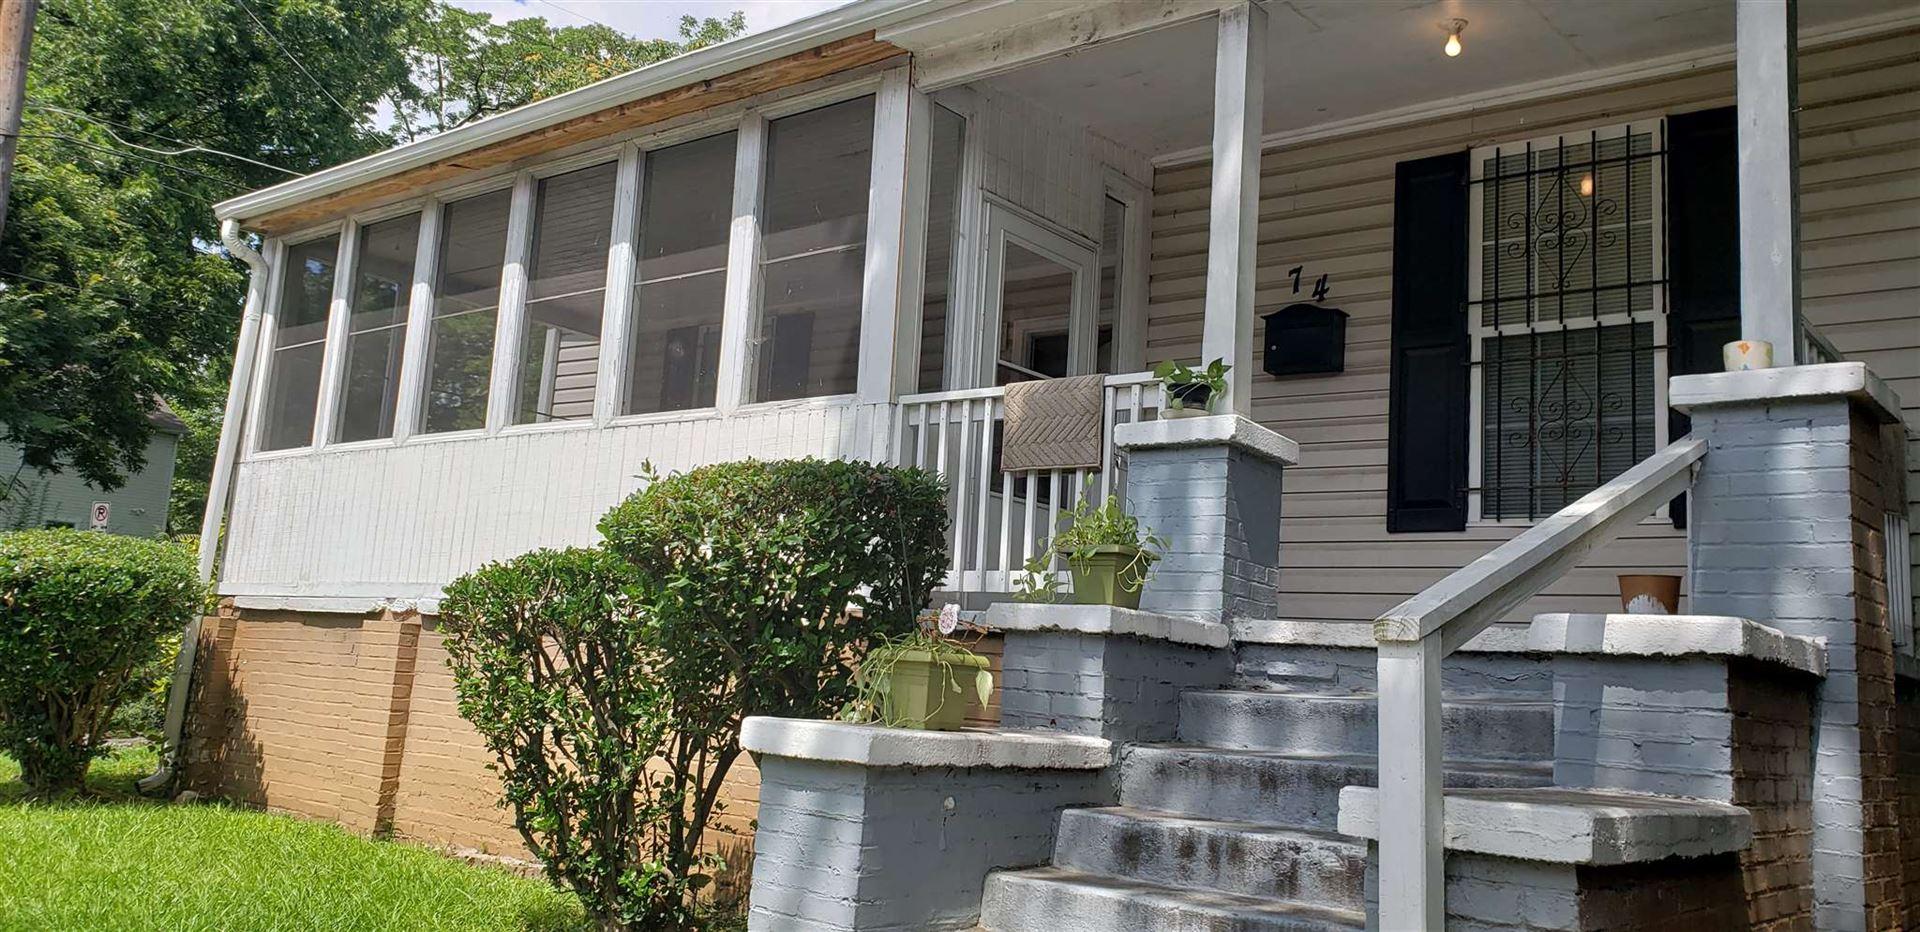 74 Joseph E Lowery Blvd, Atlanta, GA 30314 - #: 8814081